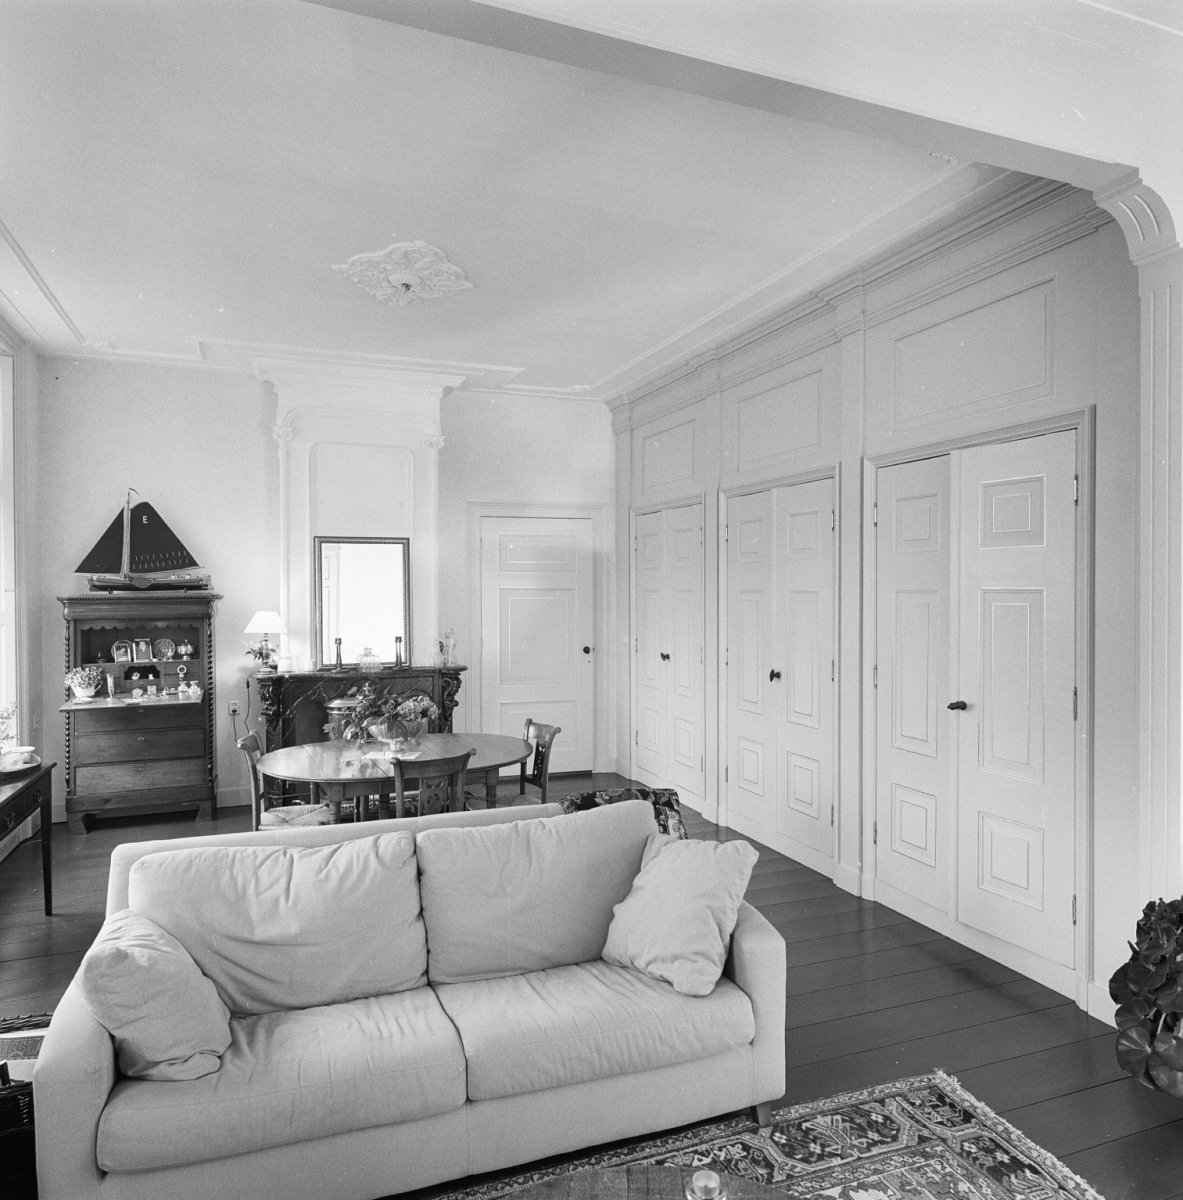 File:Interieur, overzicht woonkamer met kastenwand - 20000301 ...